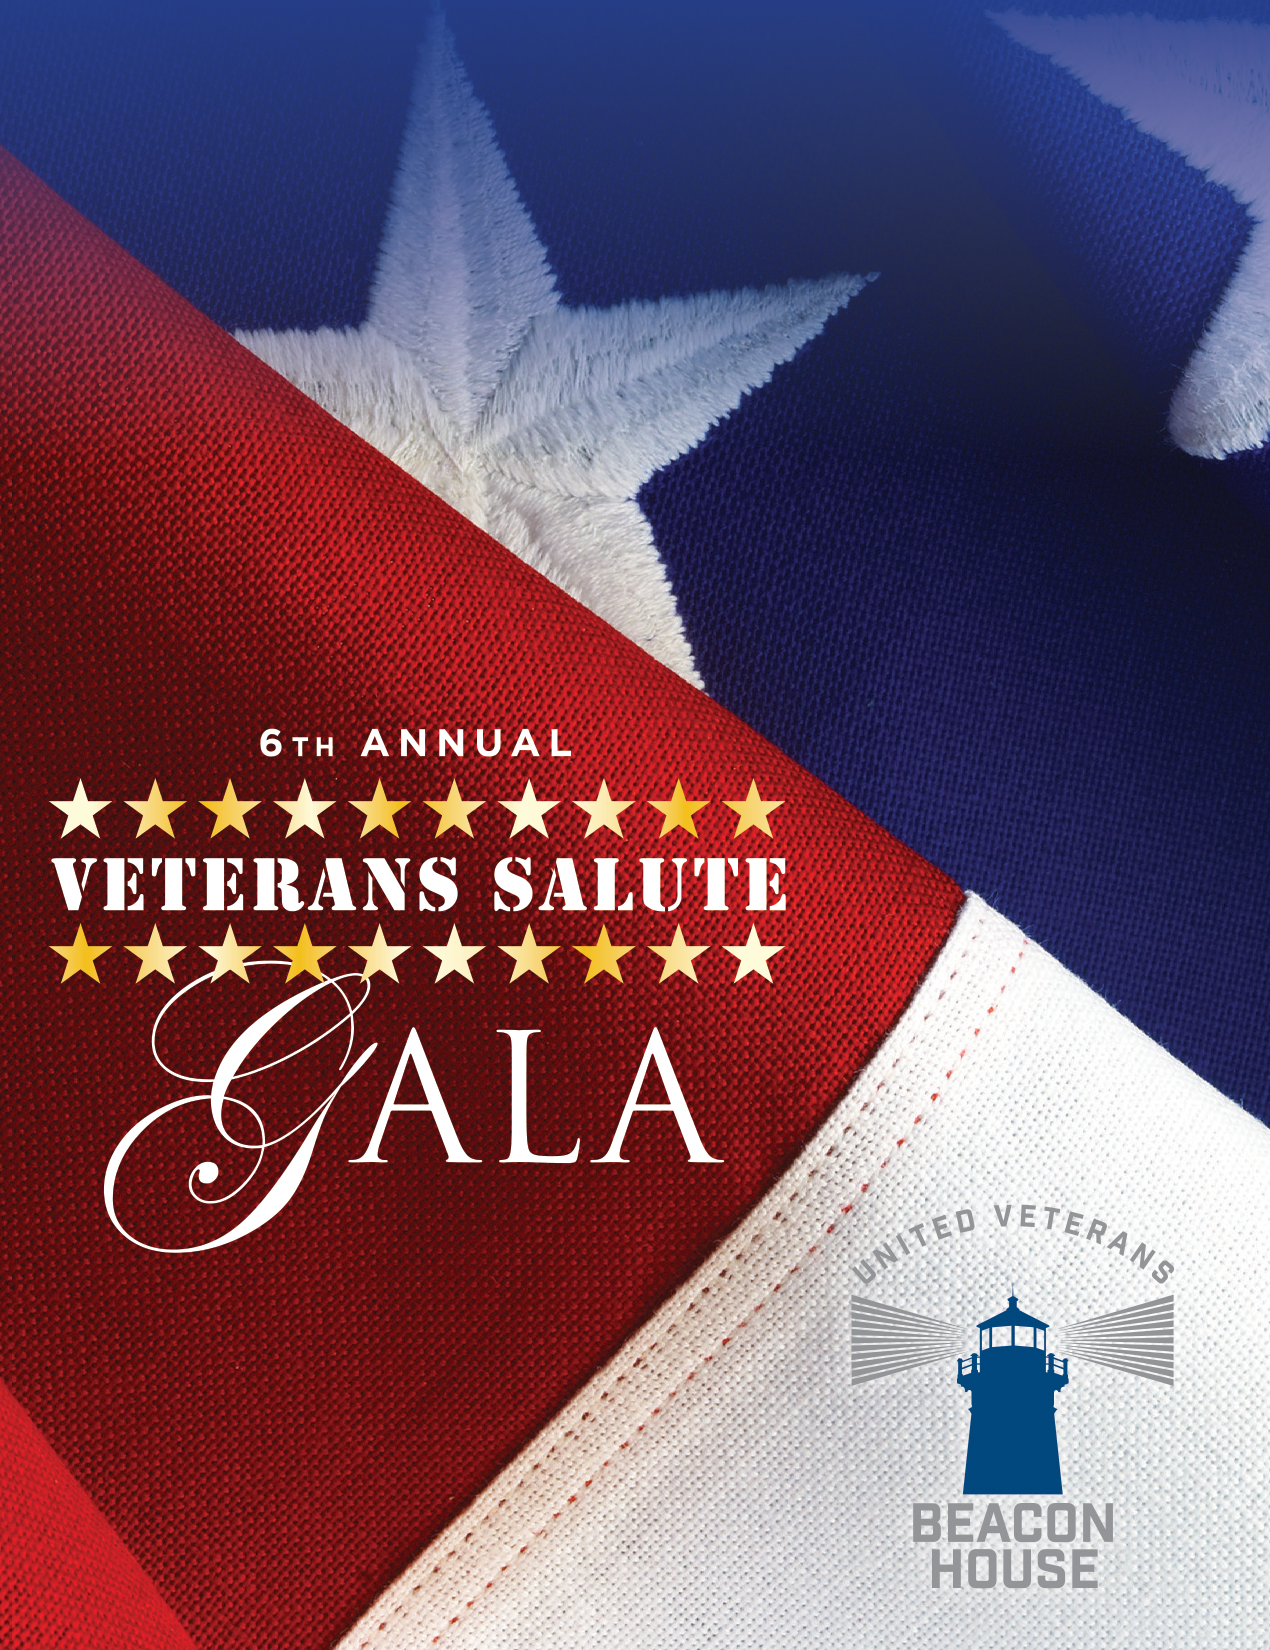 6th Annual Veterans Salute GALA